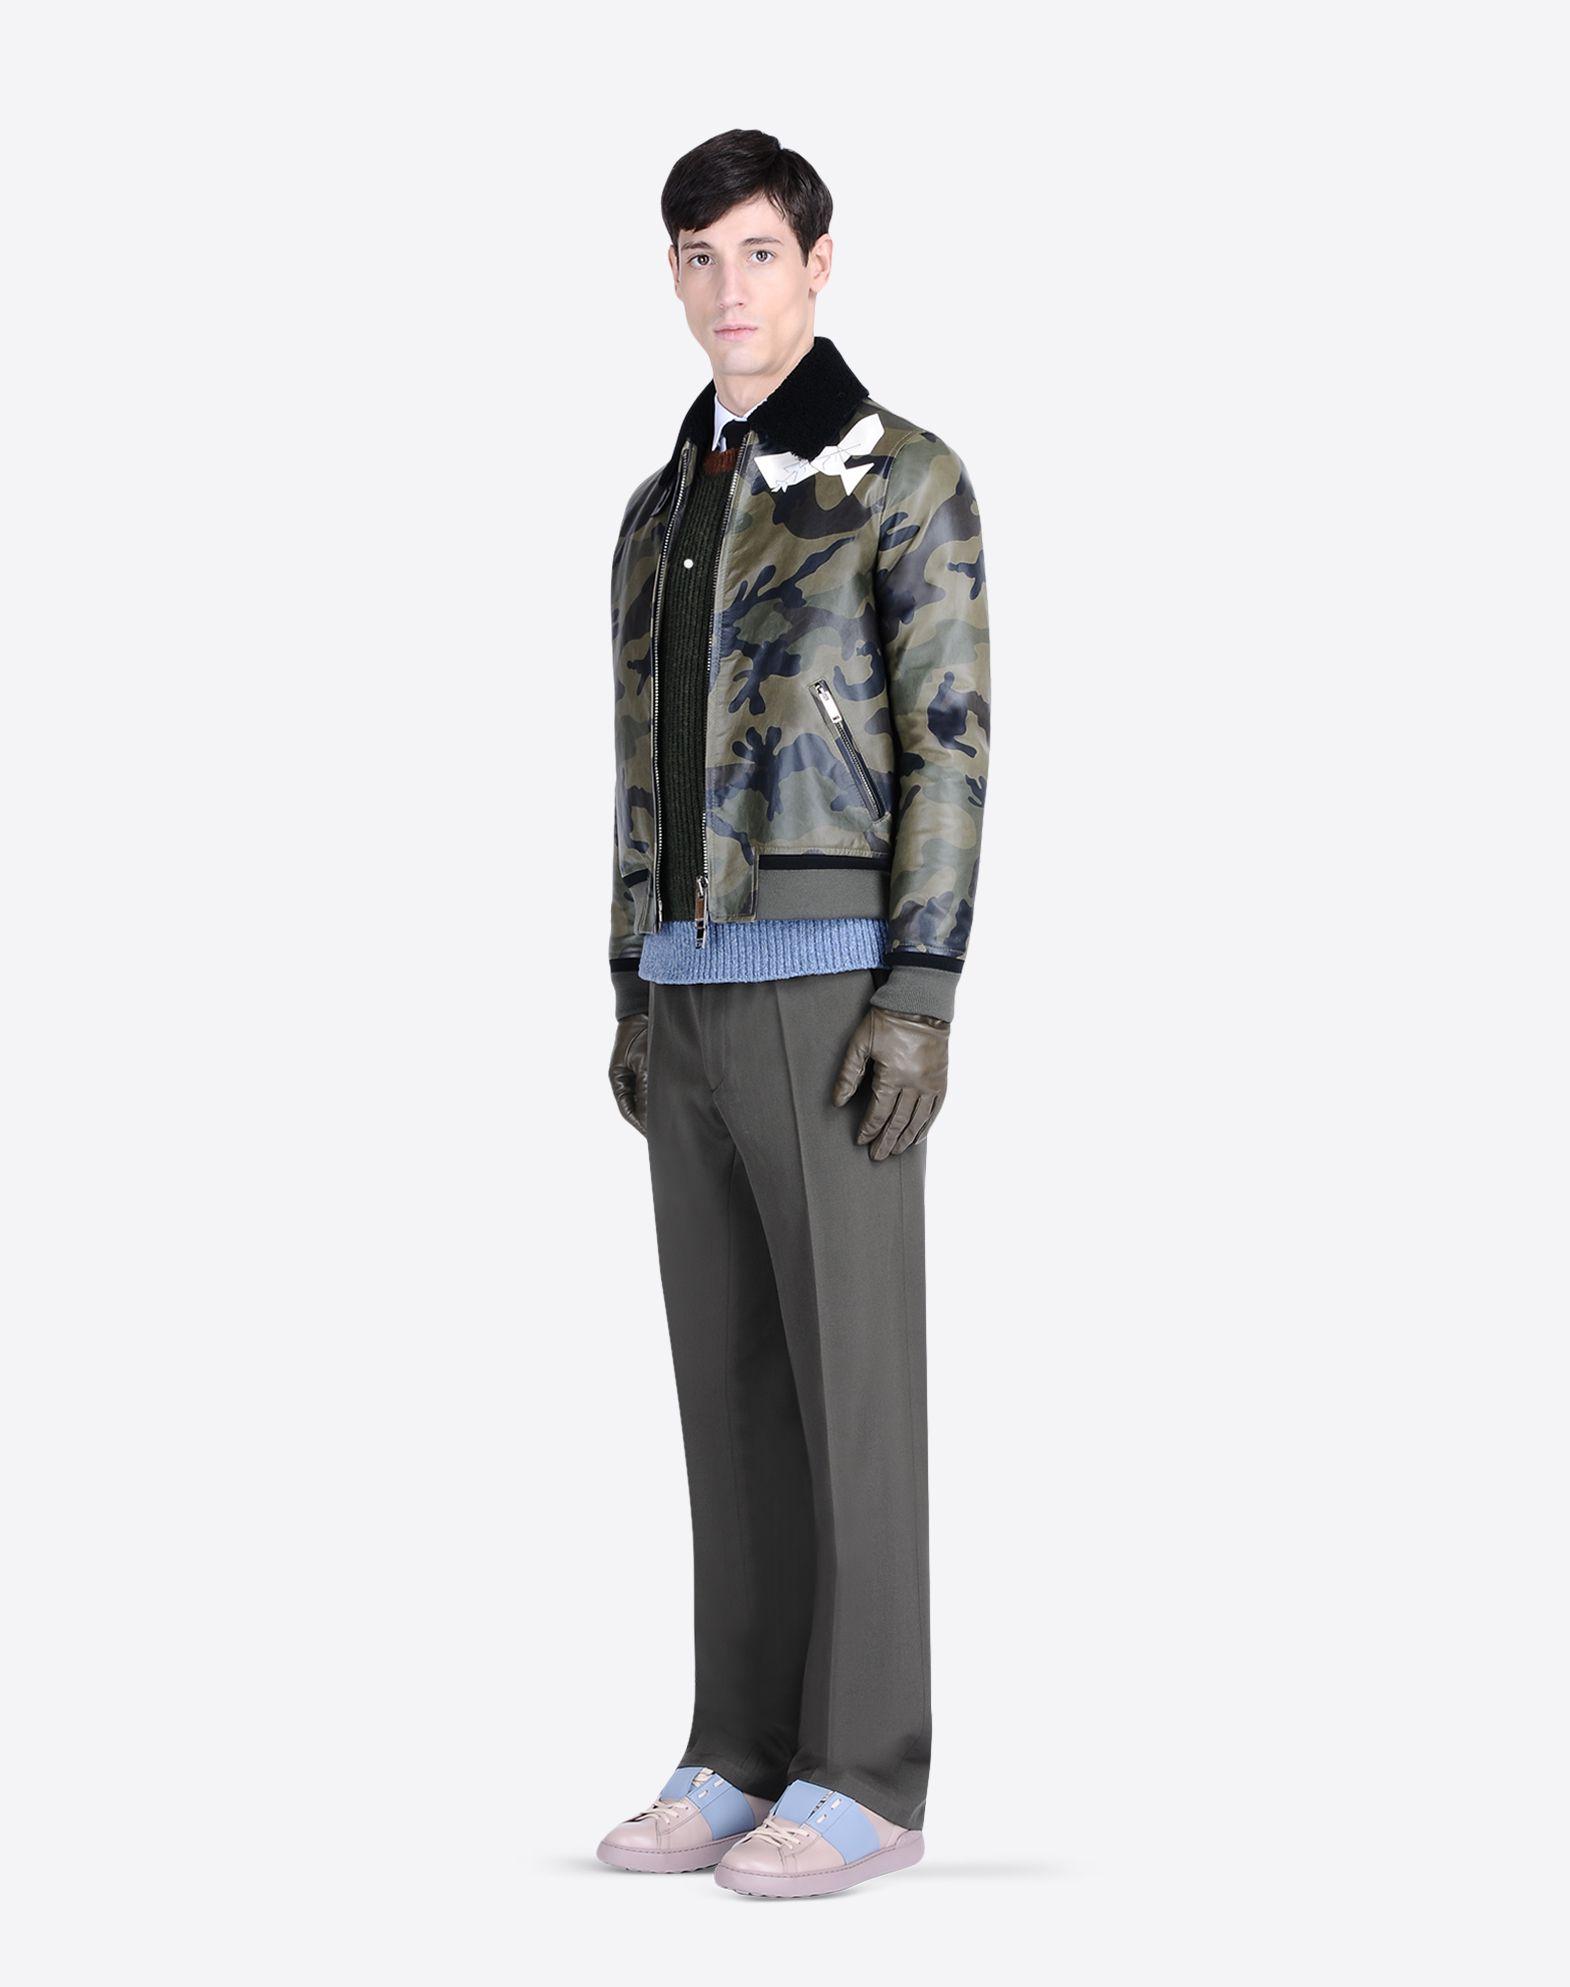 Veste camouflage valentino homme